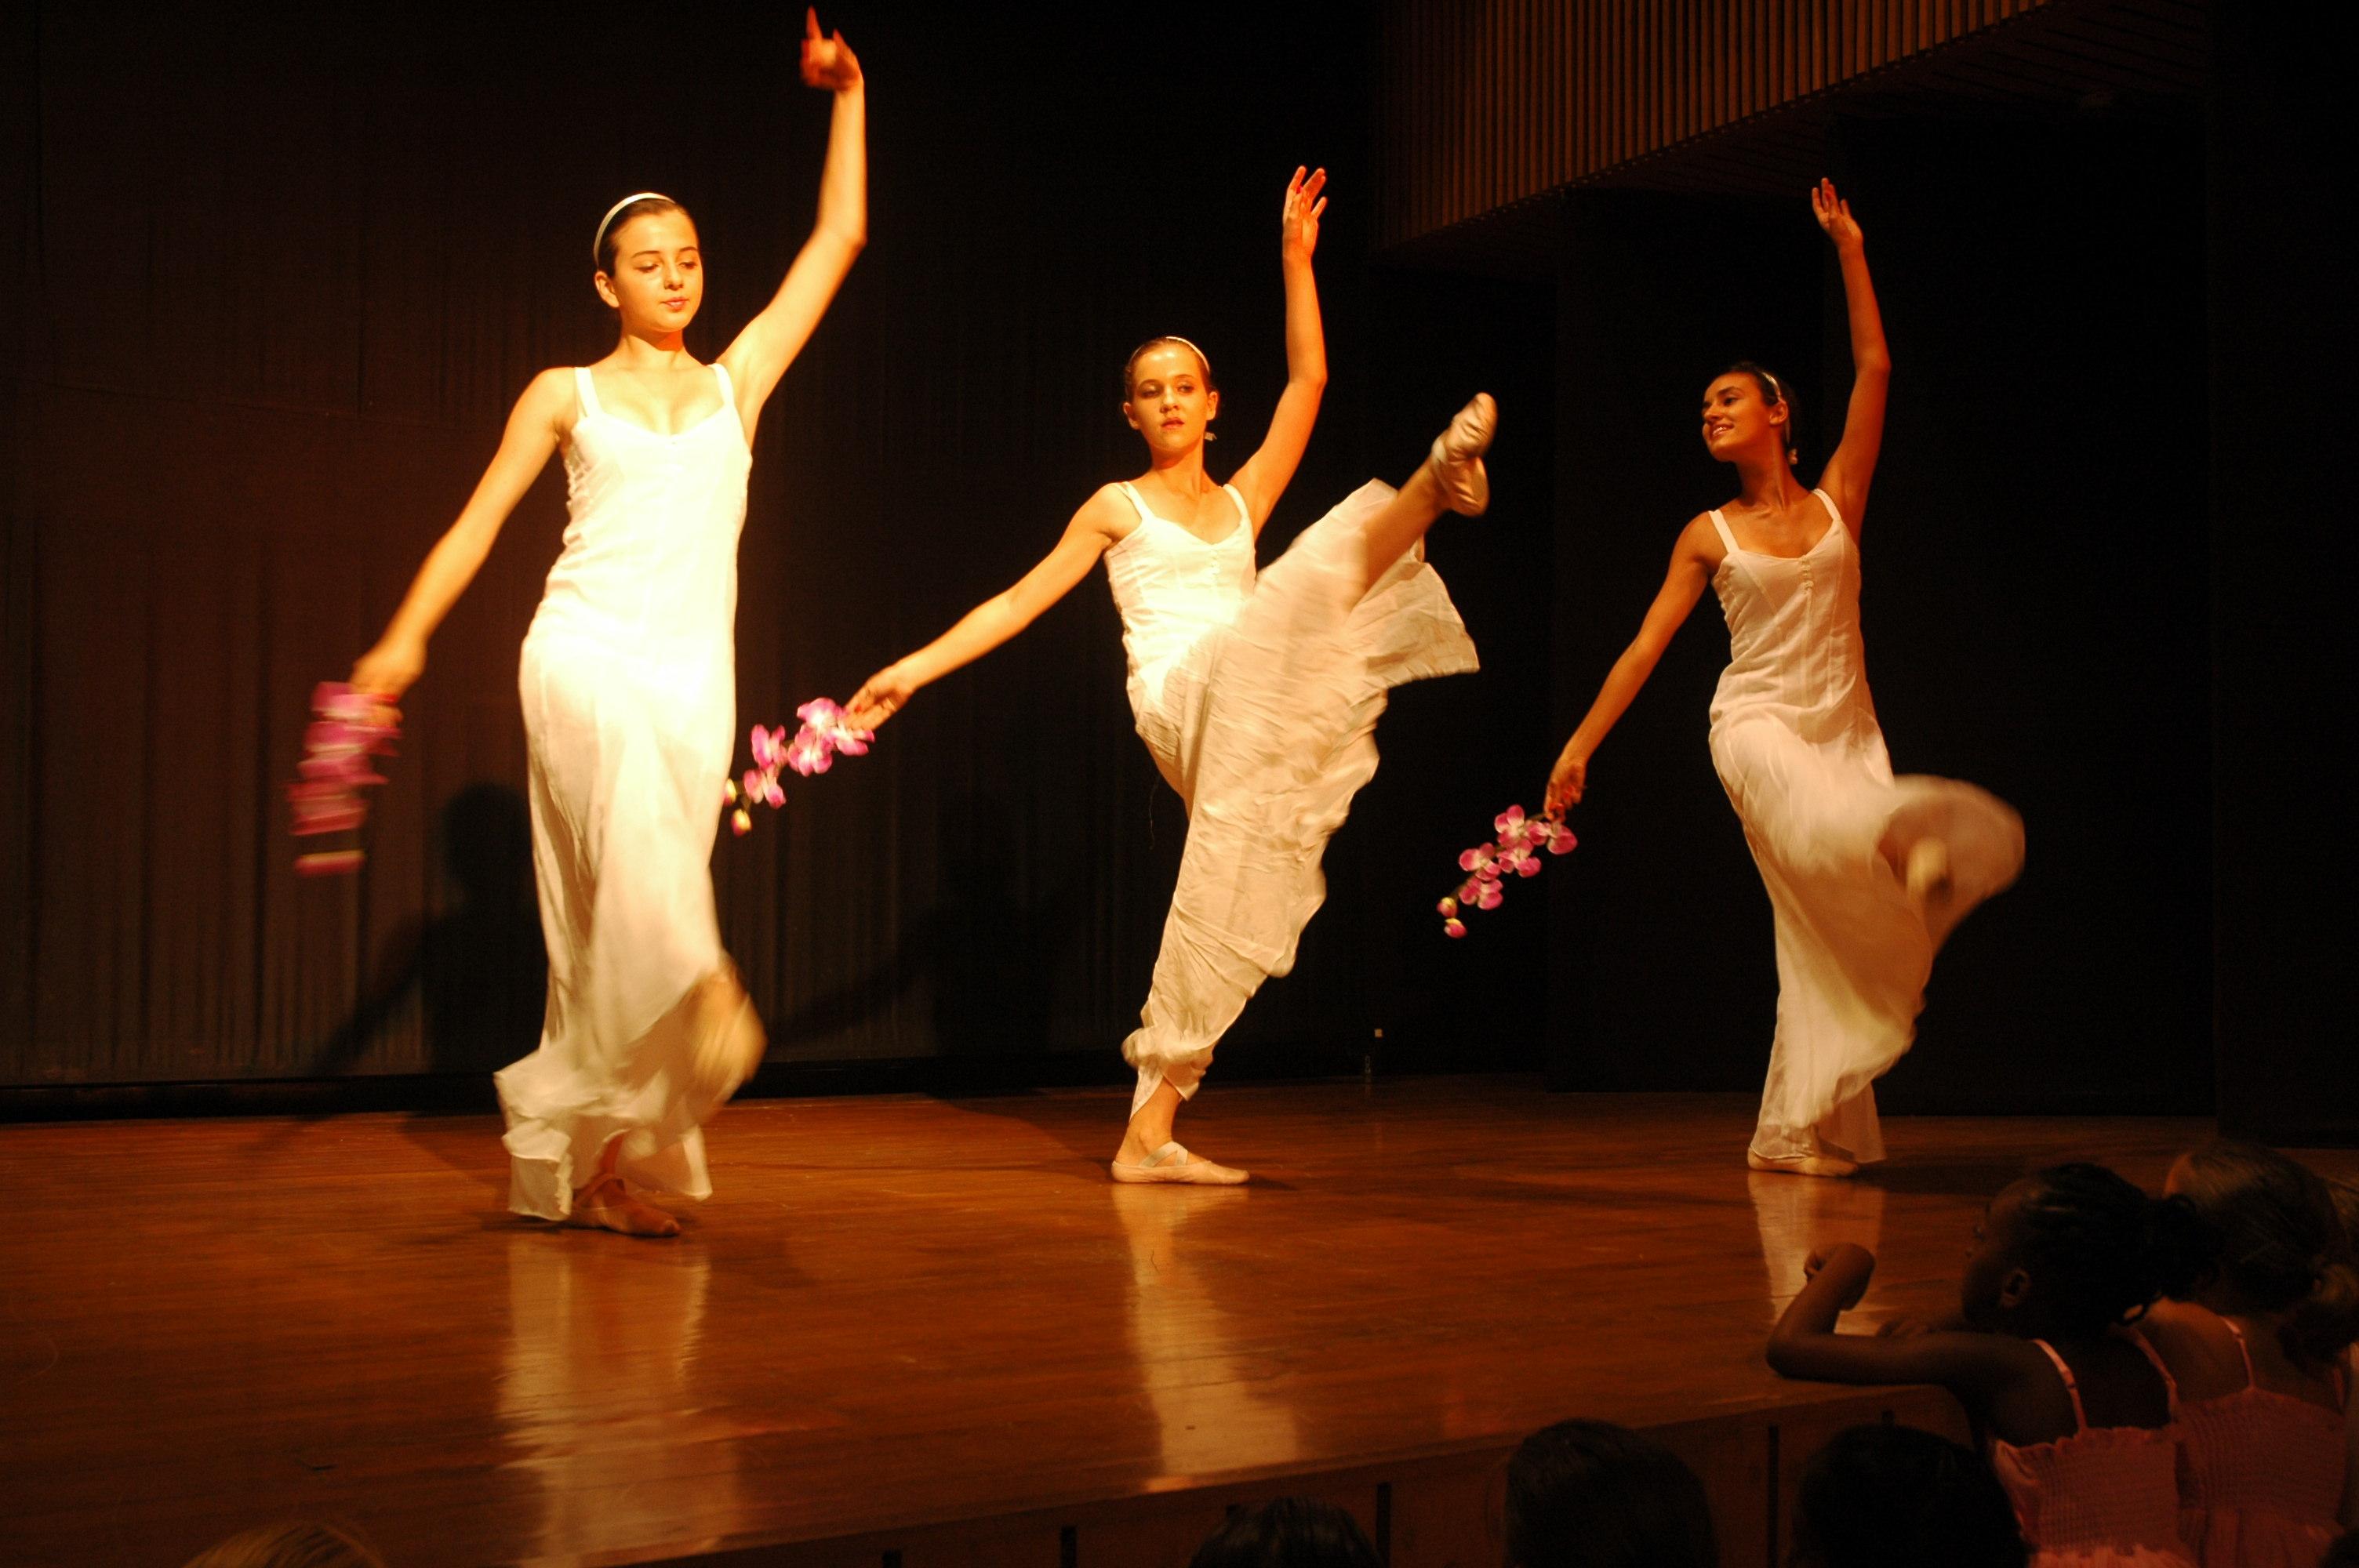 Young ballet dancers, France